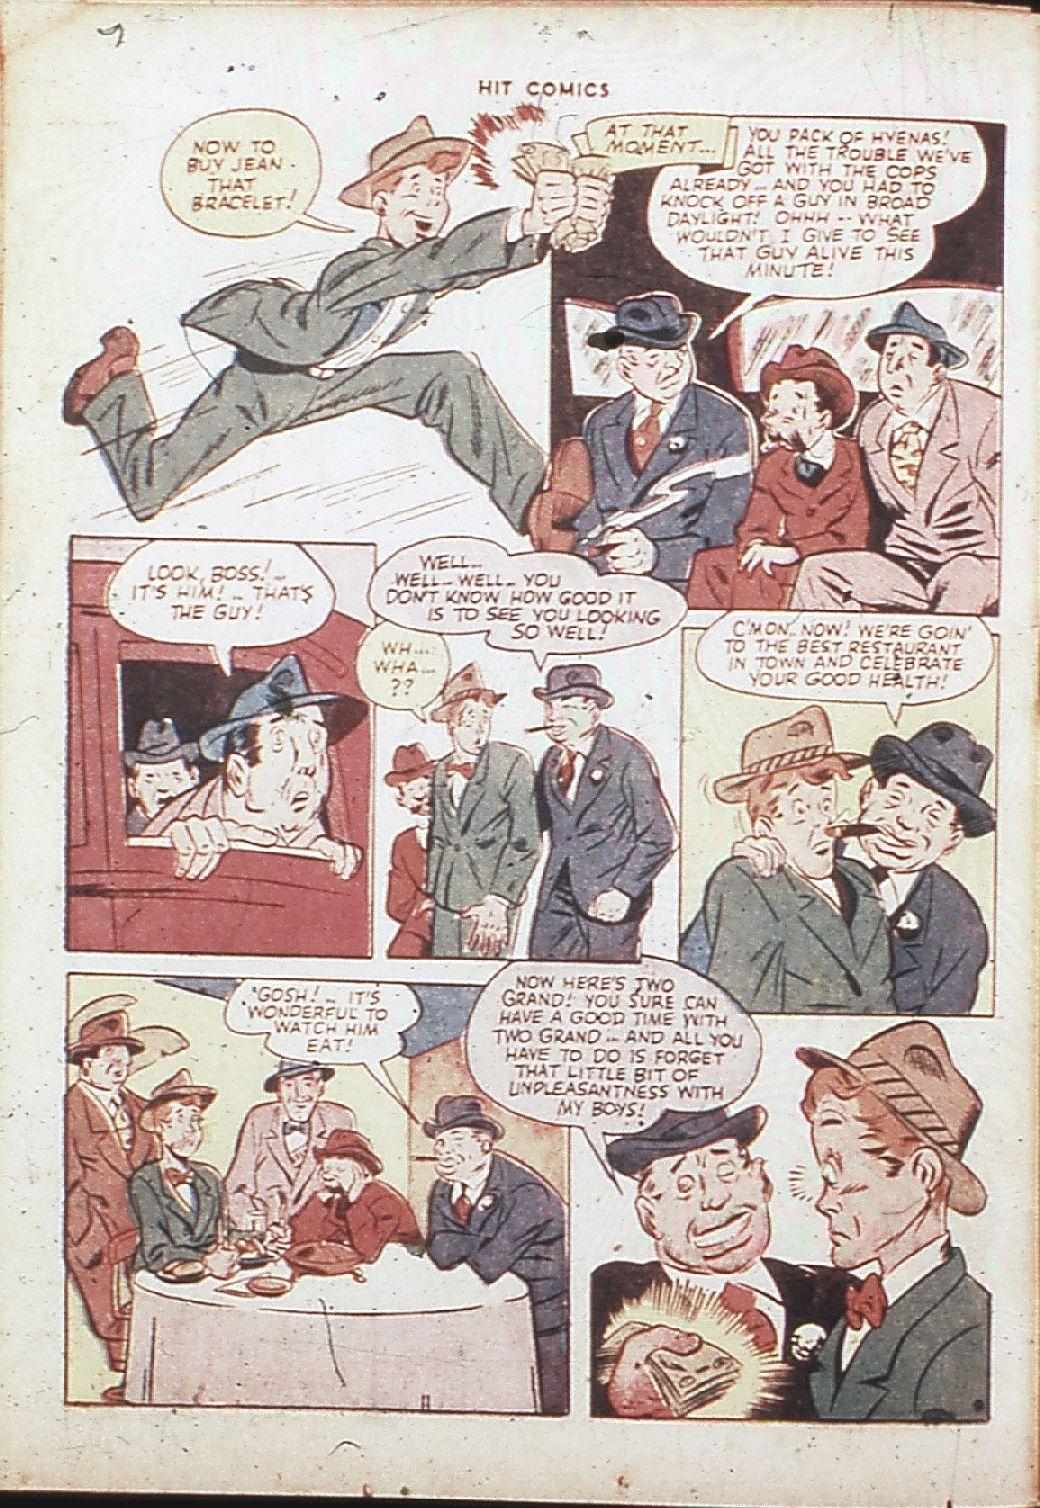 Read online Hit Comics comic -  Issue #30 - 57